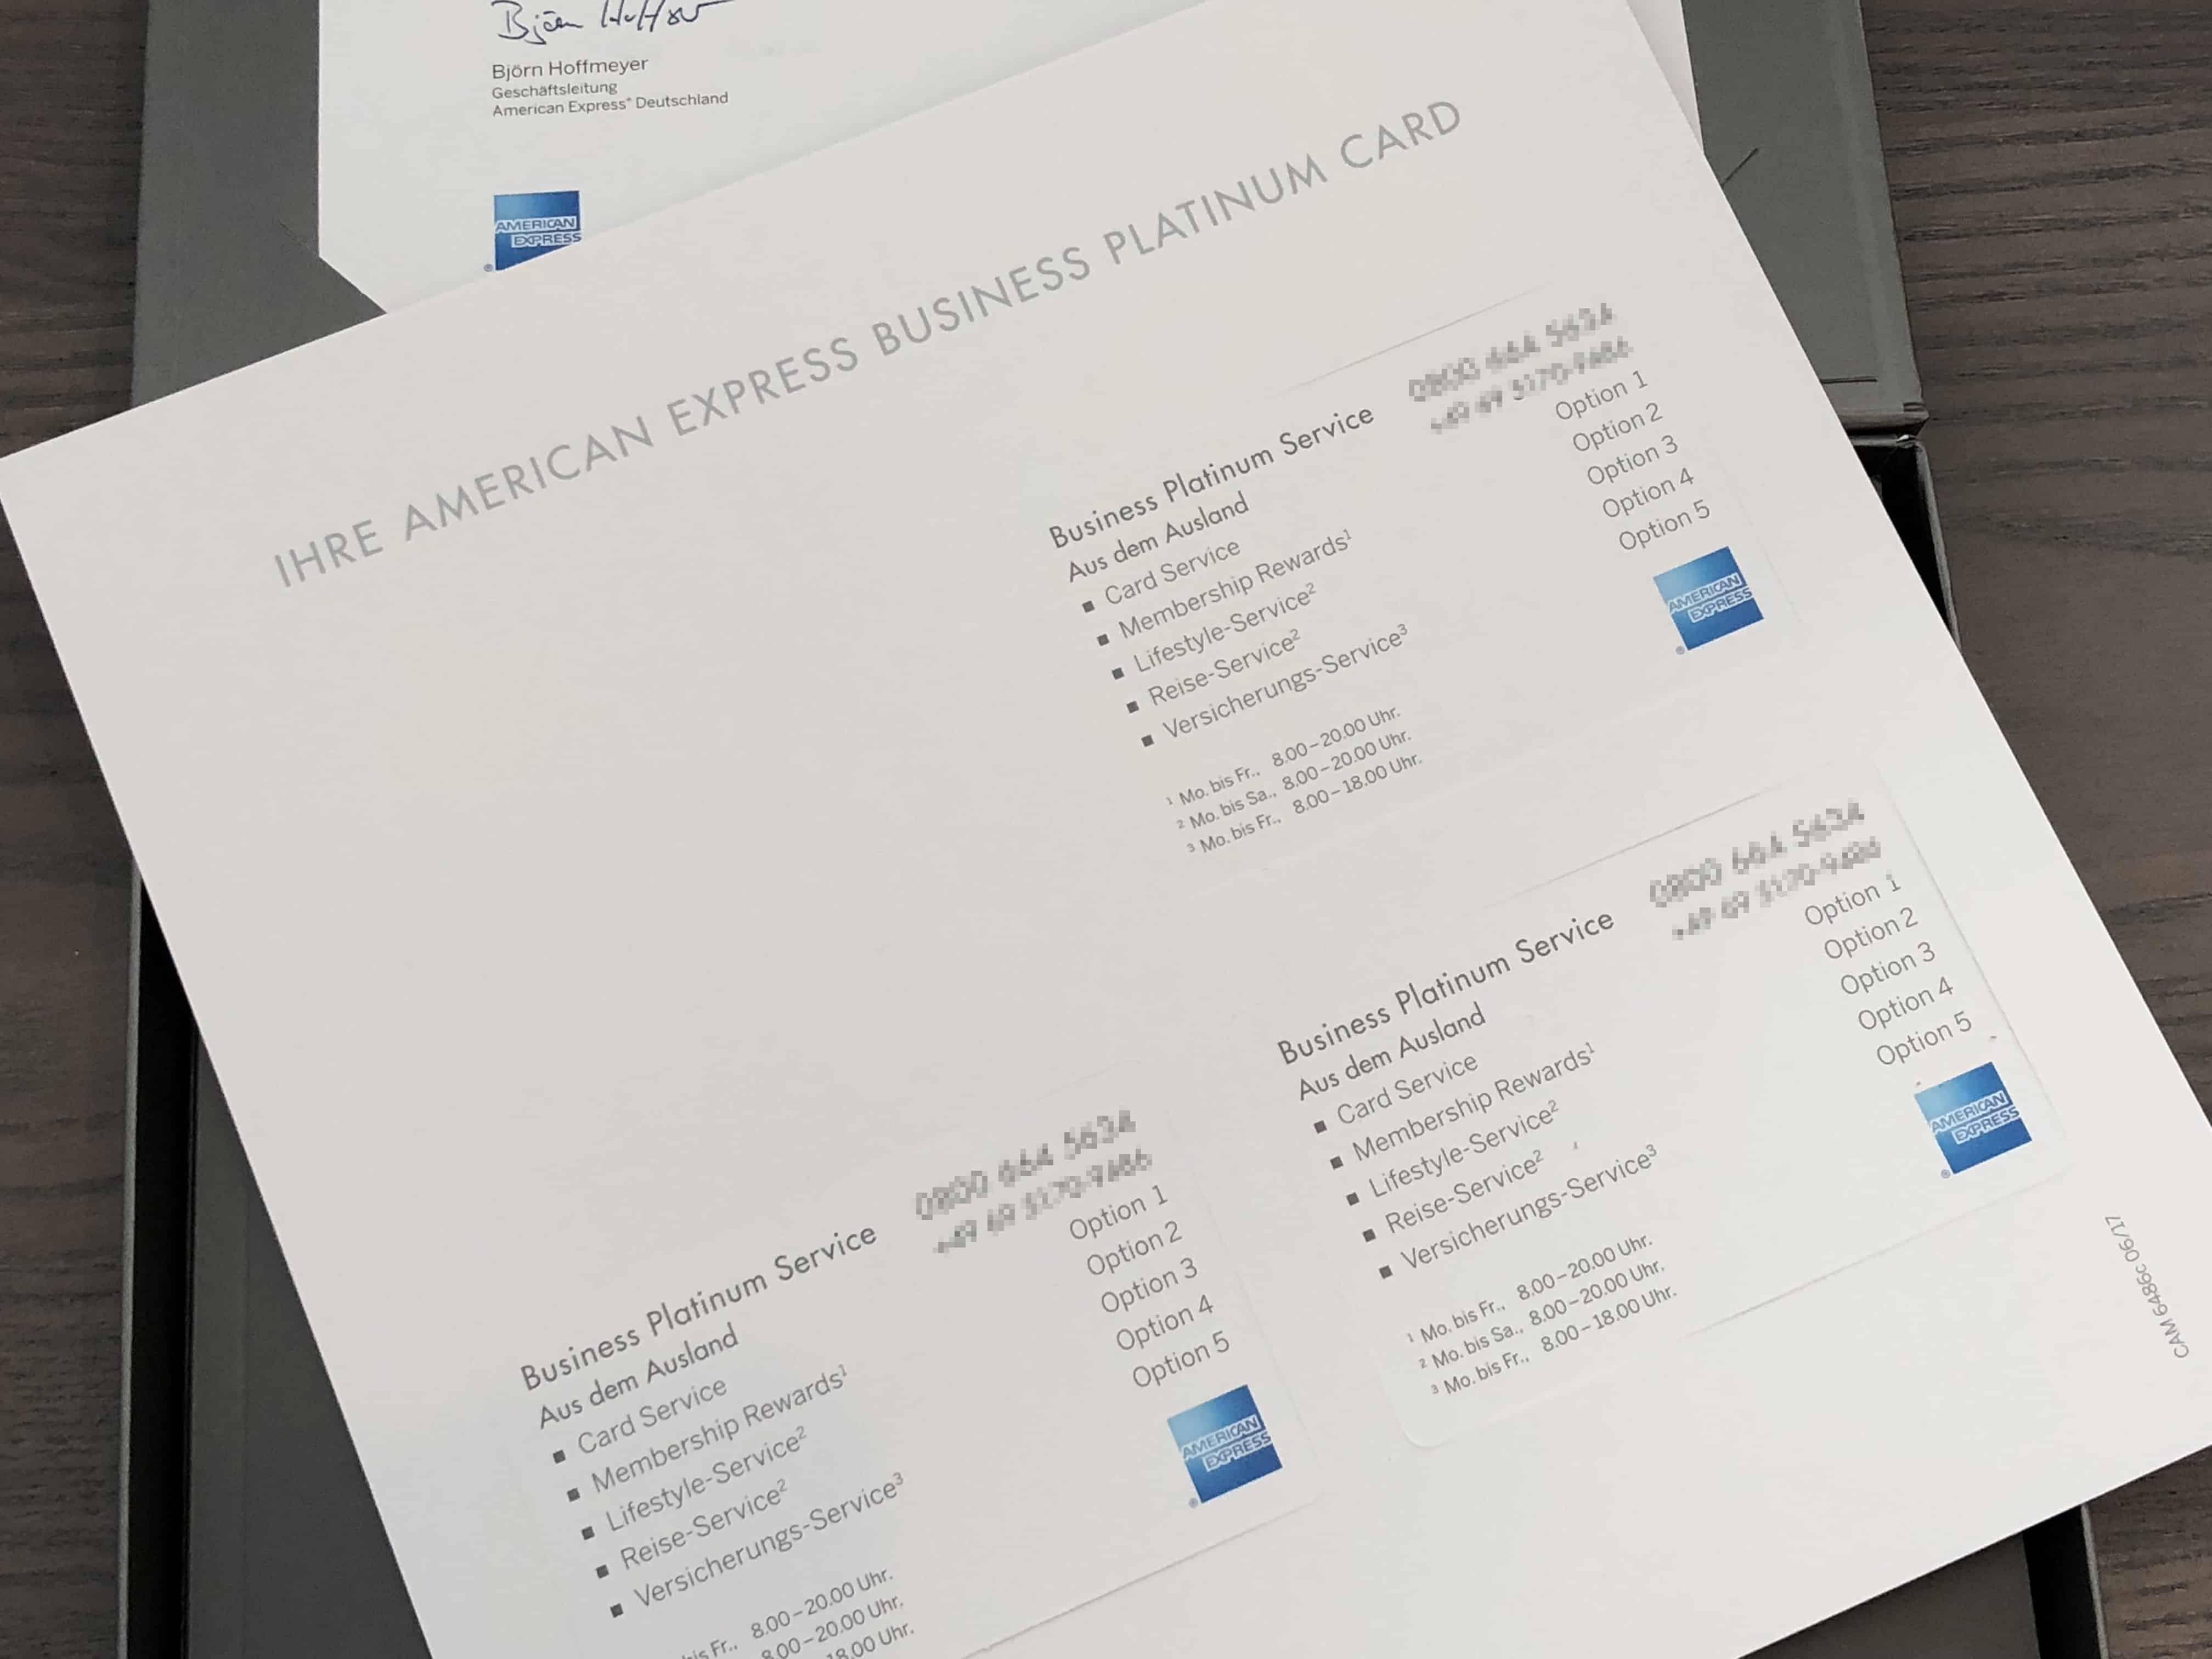 Platinum Card Service